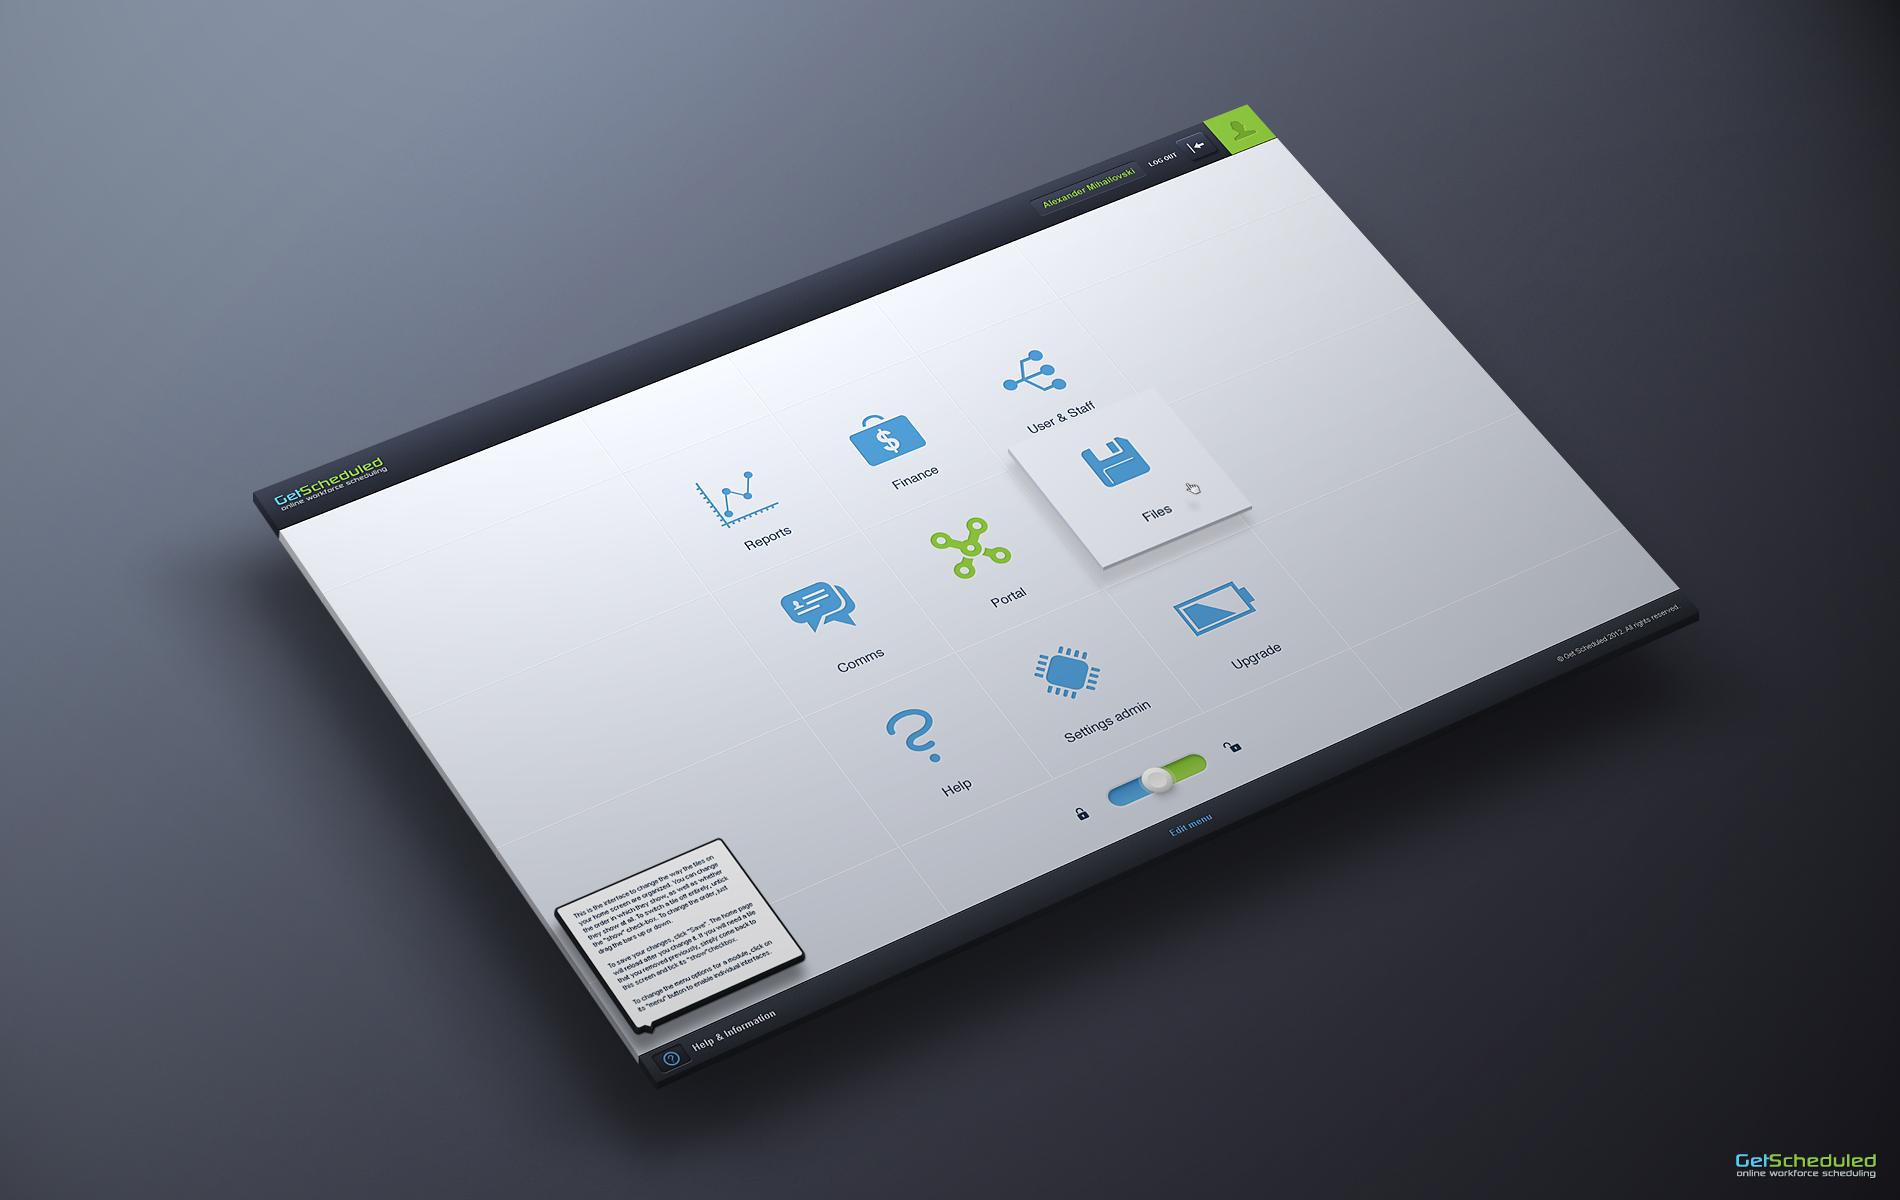 Dribbble getsheduledappusermenuhdg by mariusz onichowski getsheduled app user menu hd colourmoves Images